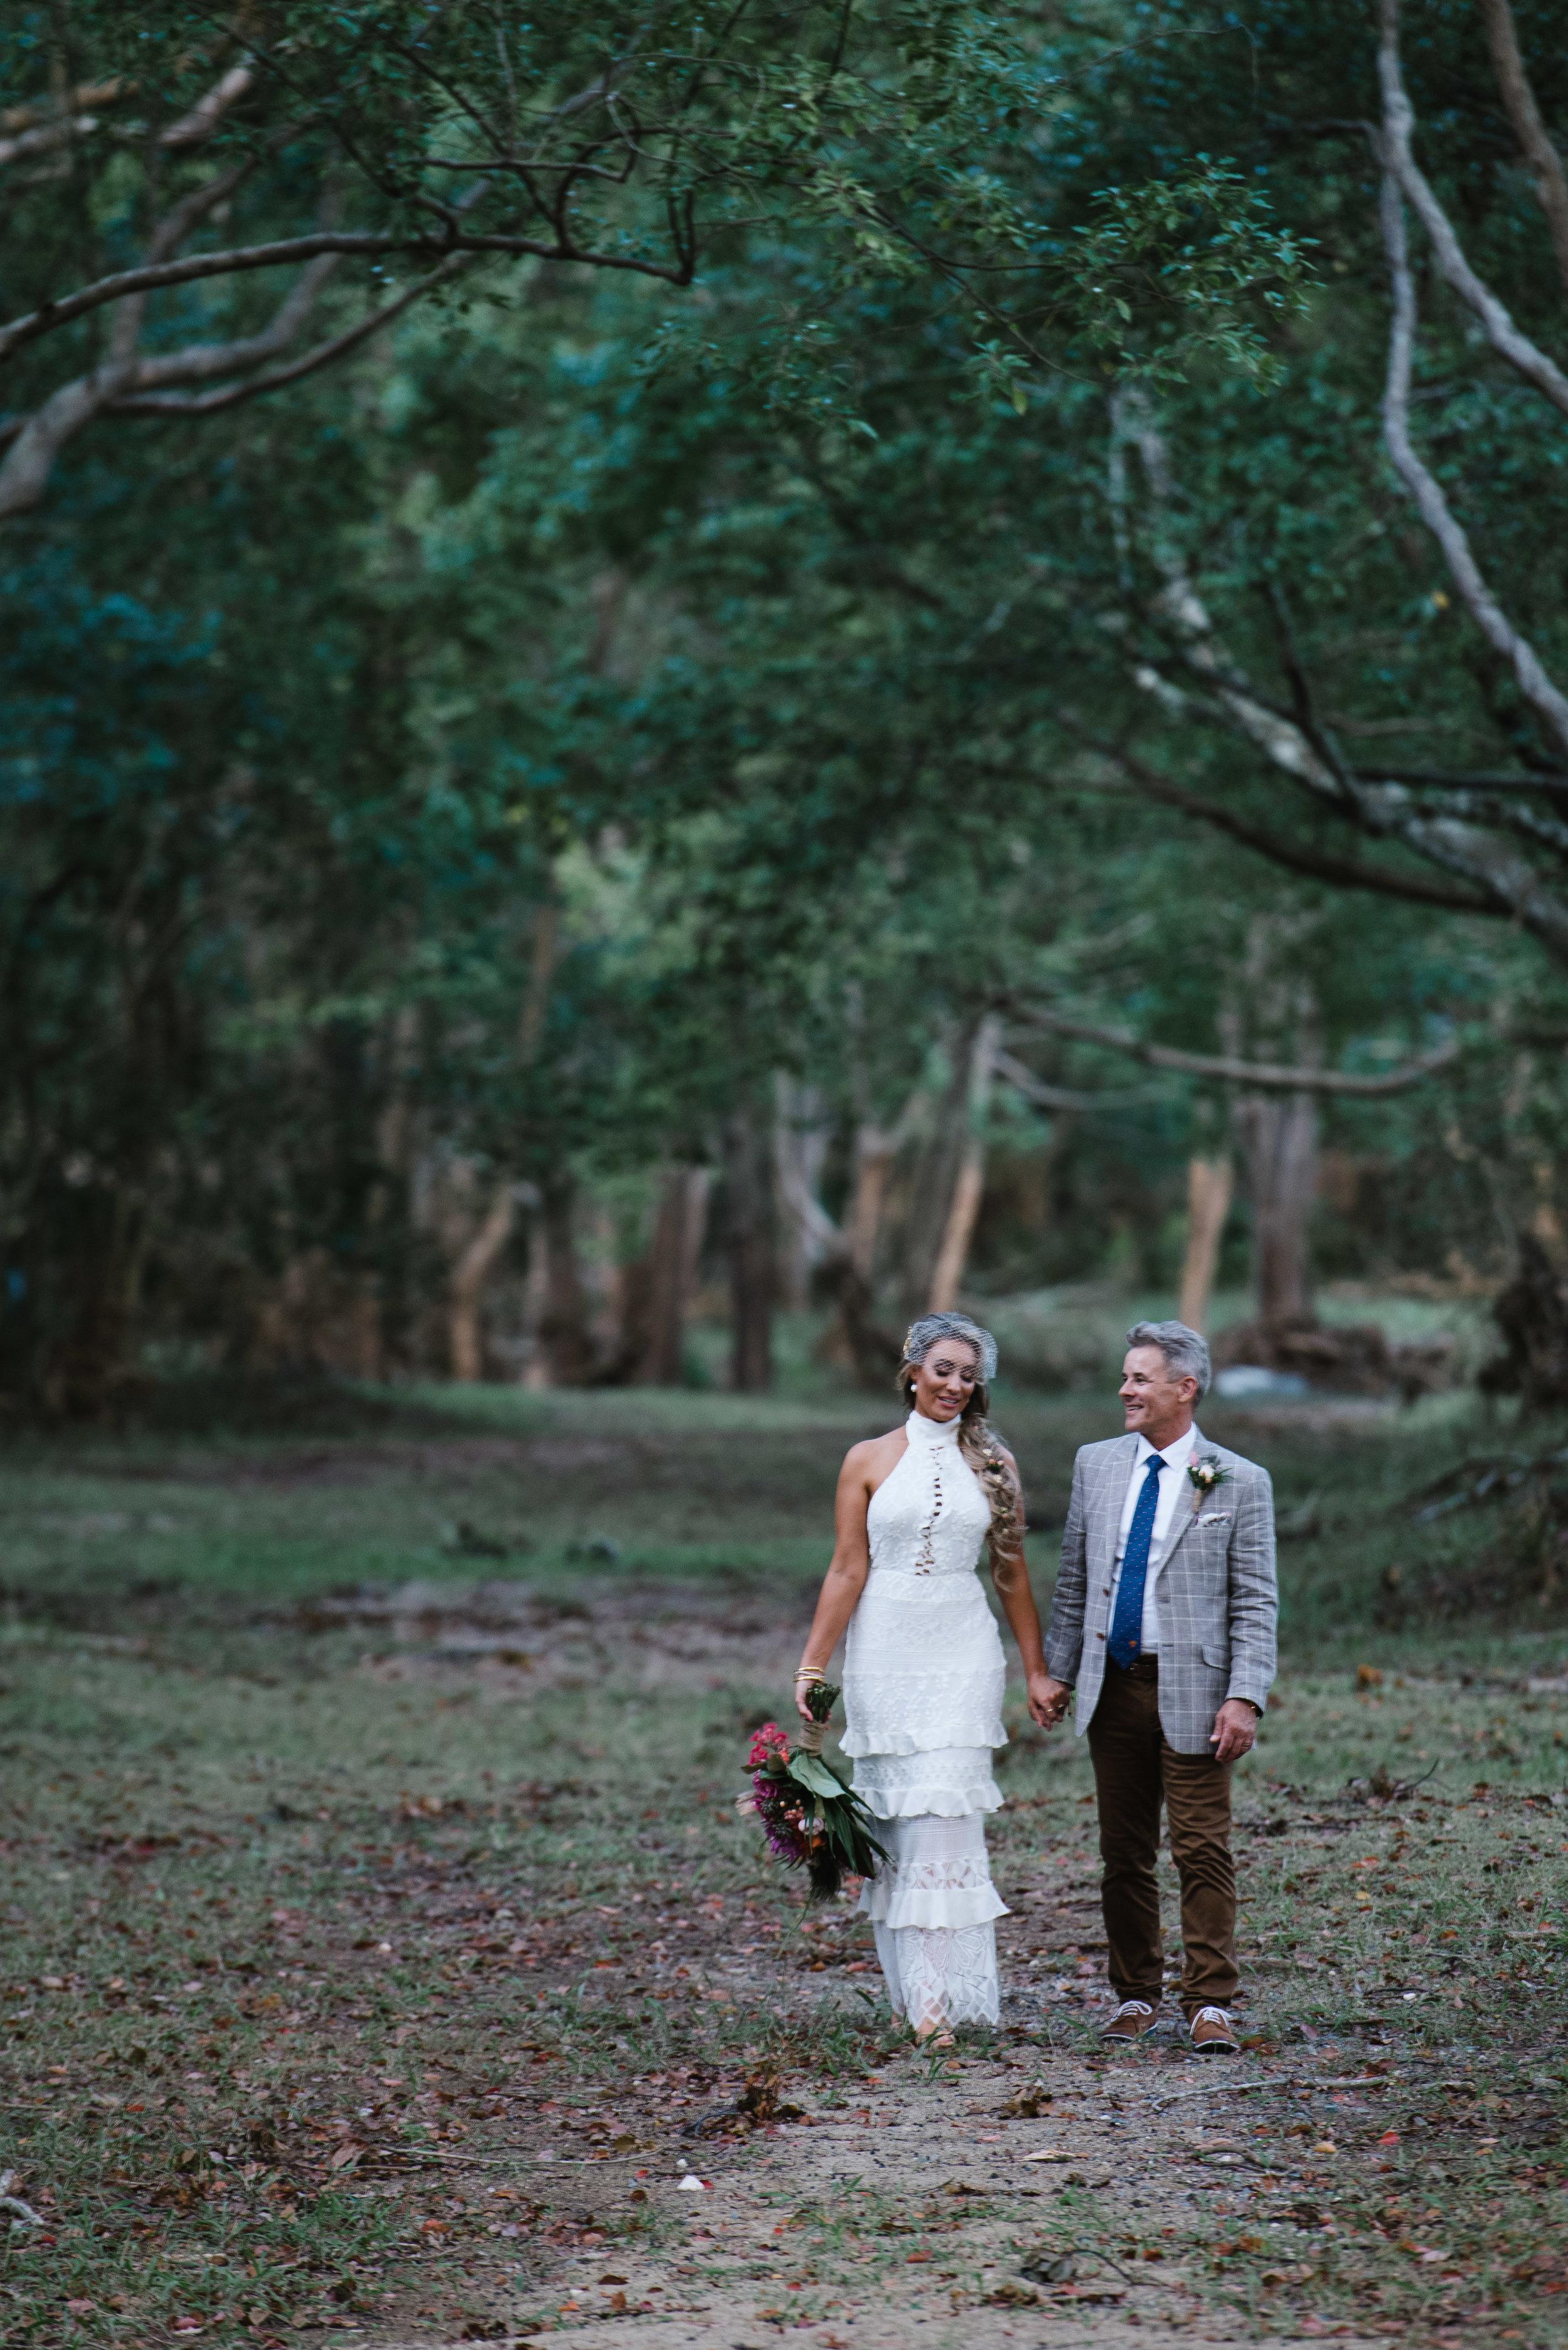 leah and cliff- skyla sage photography   wedding photographer, byron bay wedding and family photographer, tweed heads wedding and family photography-256.jpg